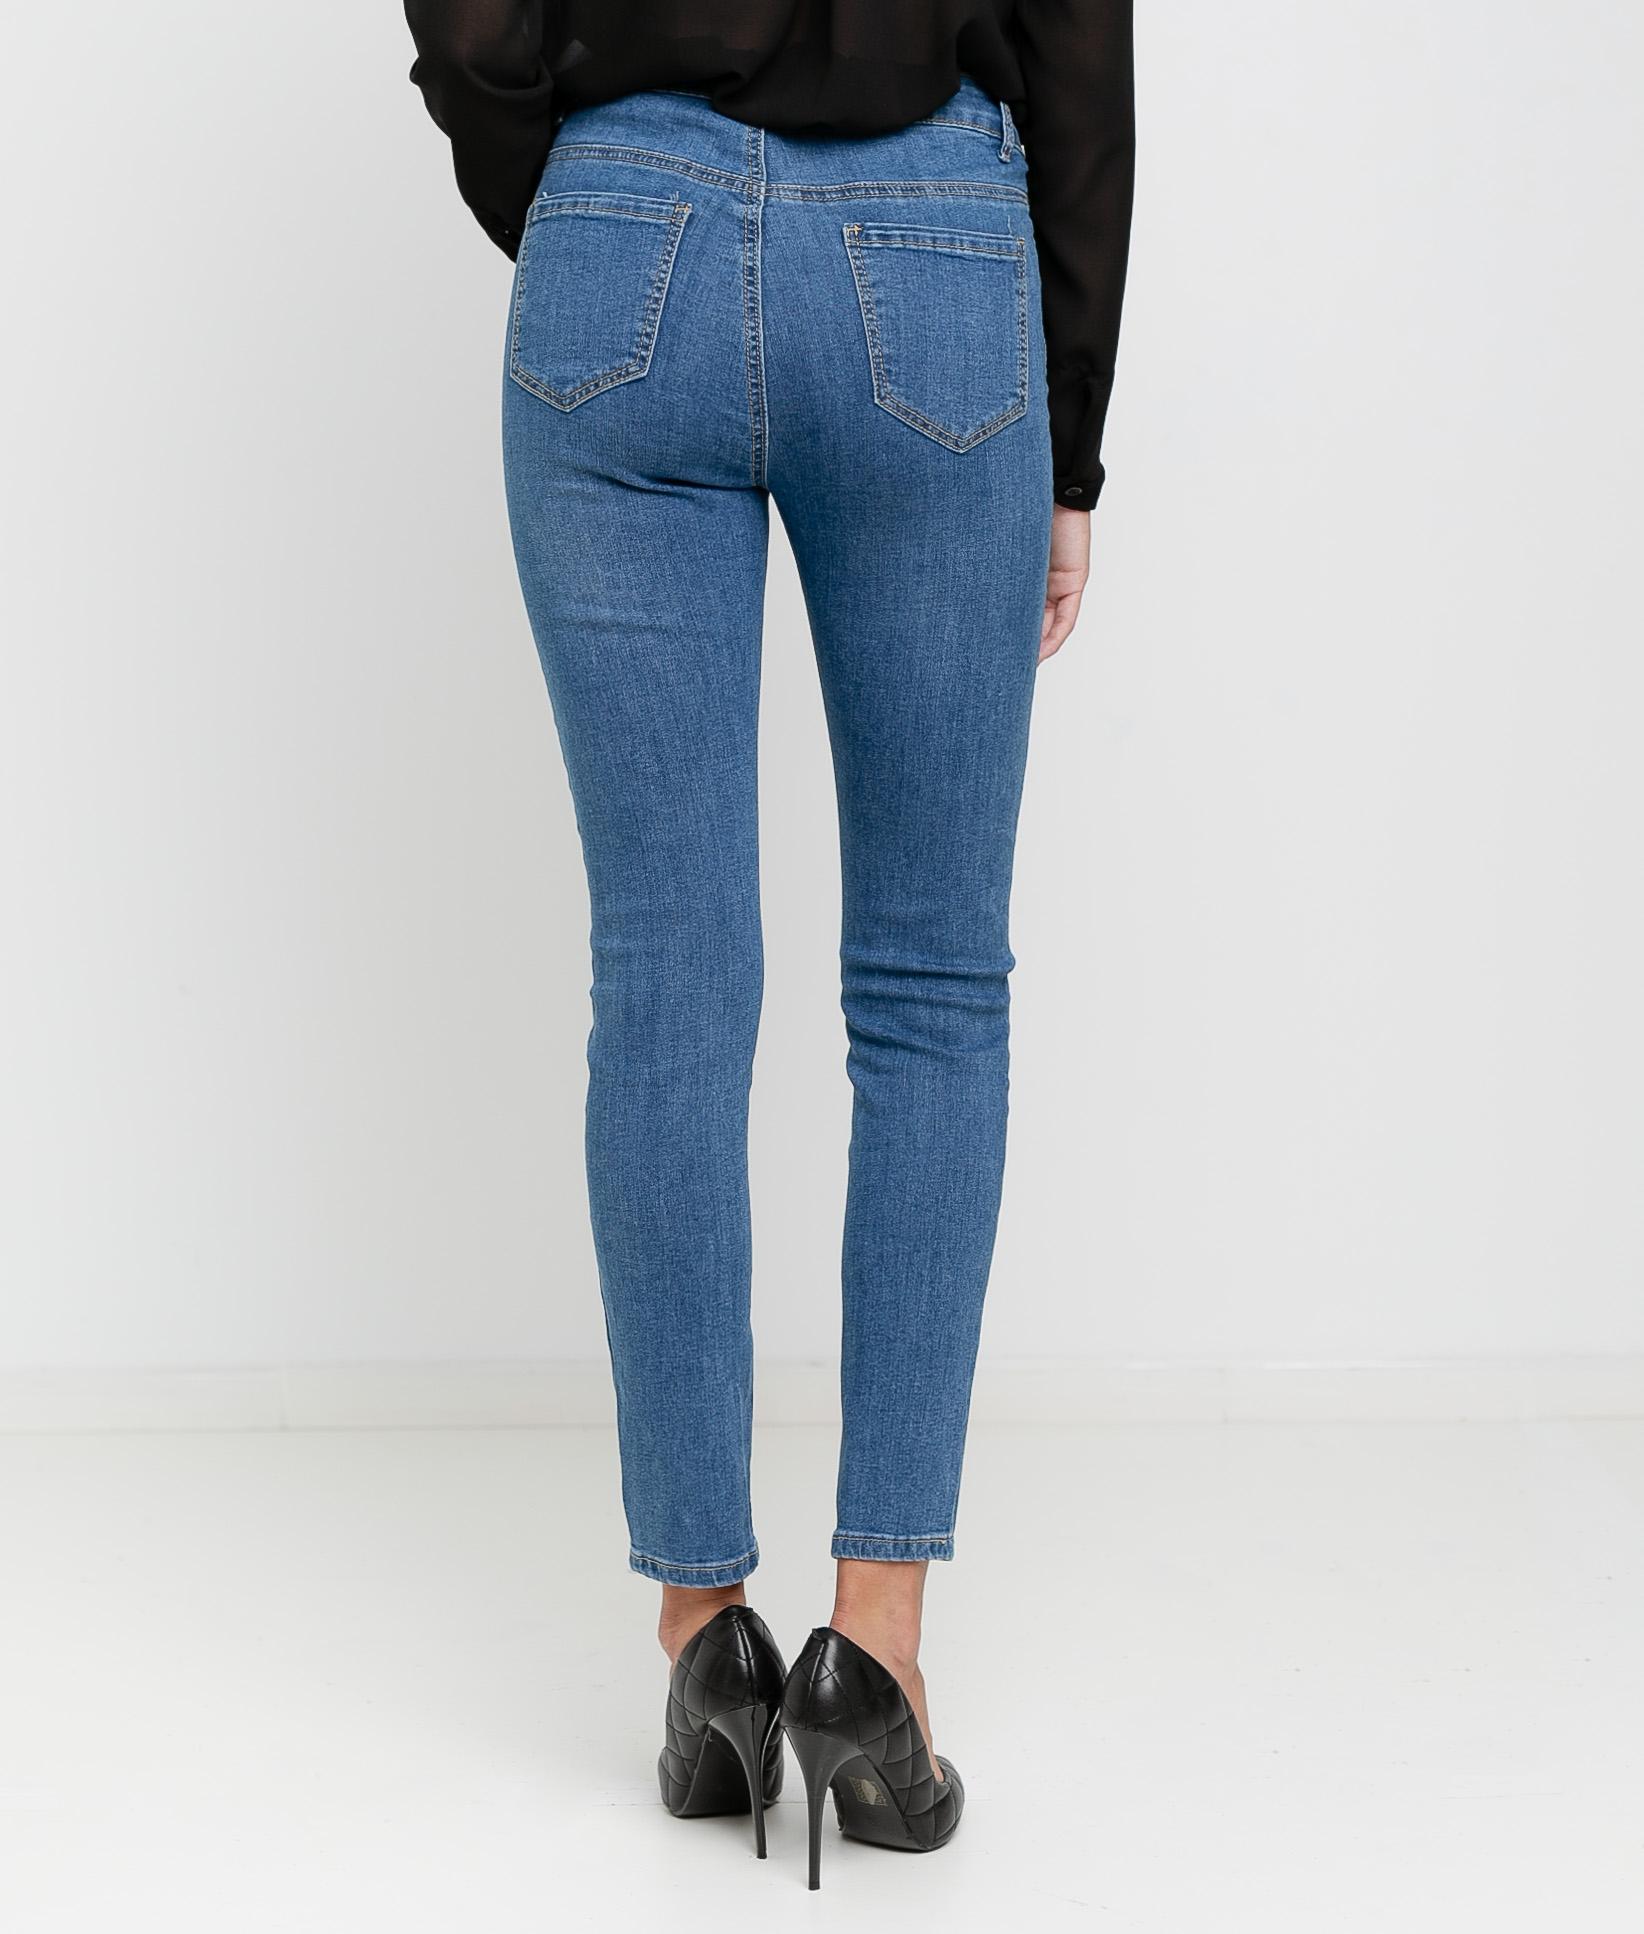 Pantalon Termi - Denim